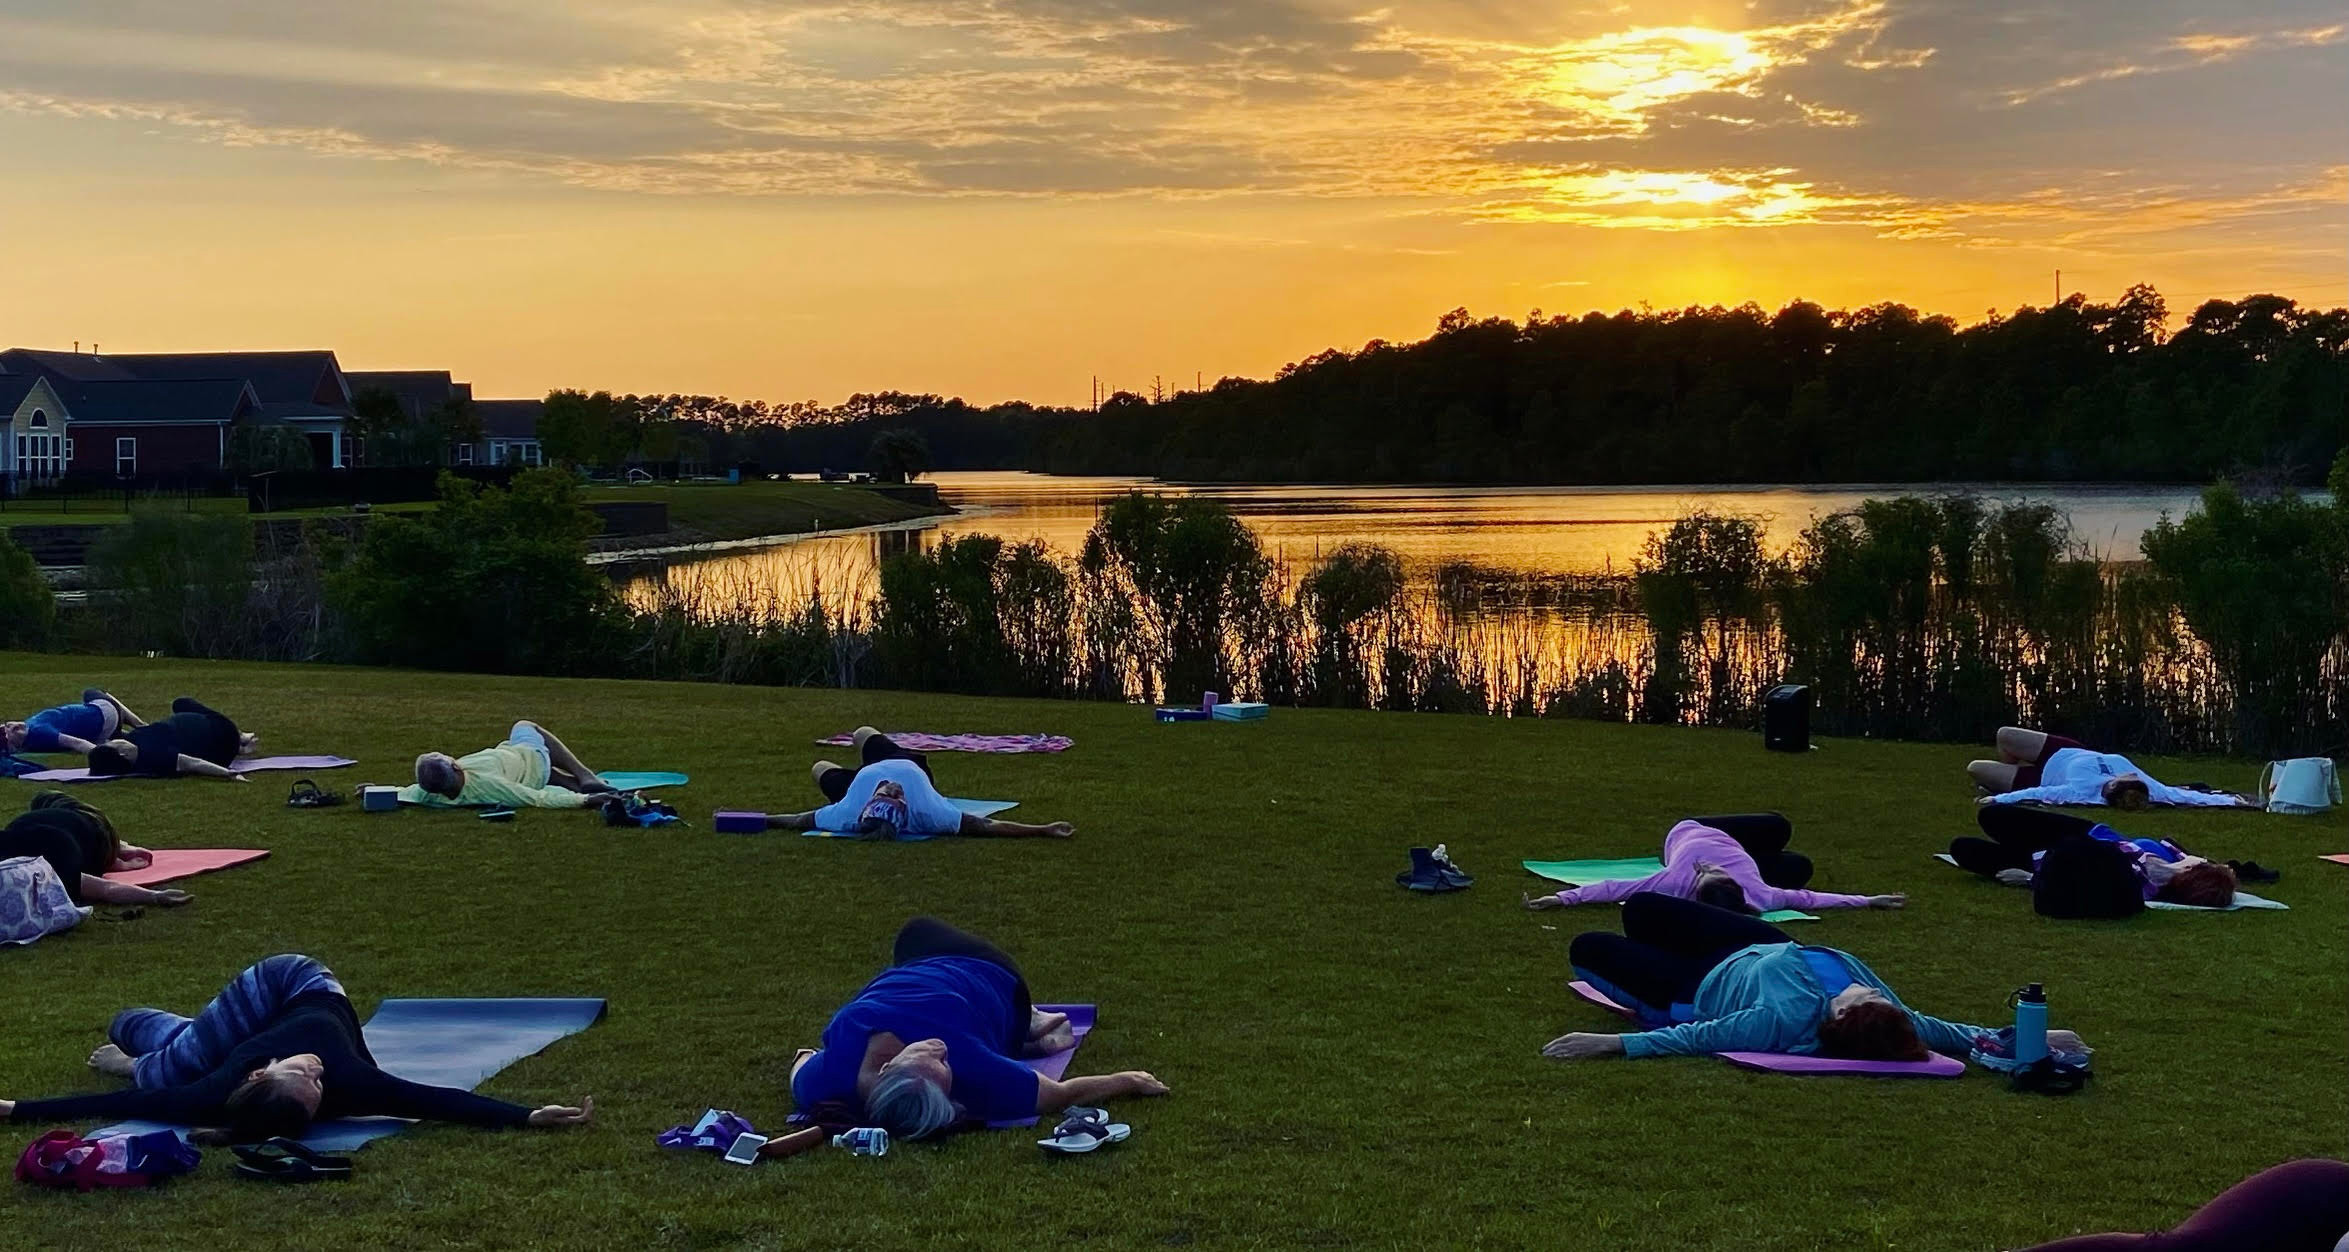 Sunset Yoga at Berkshire Forest Lake